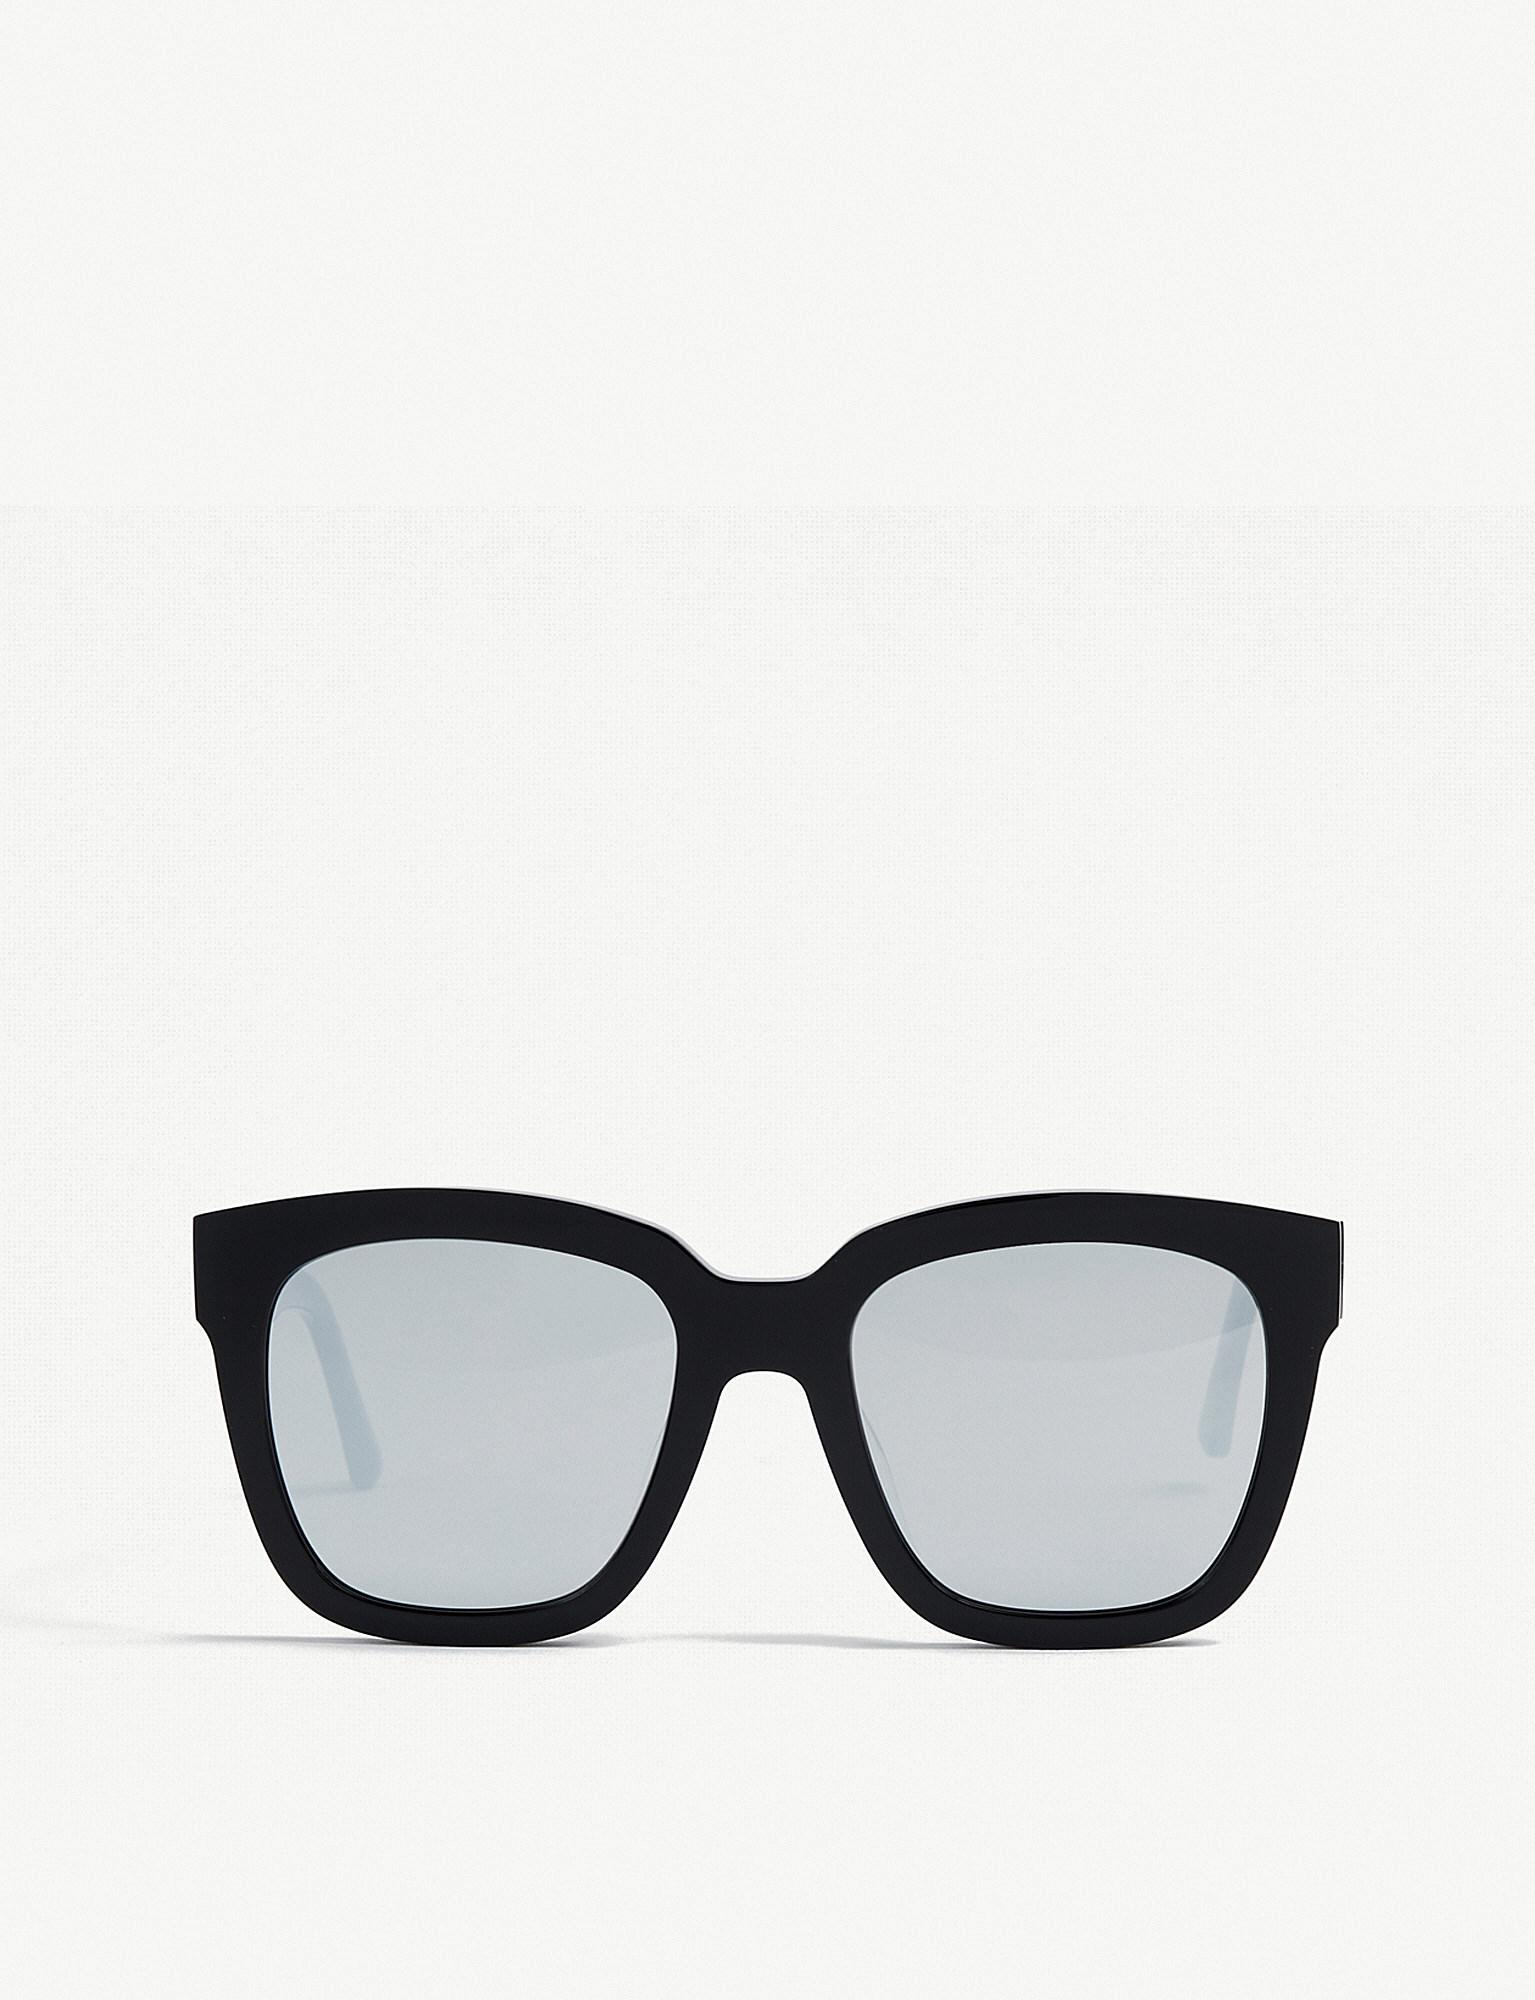 8f8e93ac62 Gentle Monster Dreamer Hoff Mirrored Acetate Sunglasses in Black - Lyst